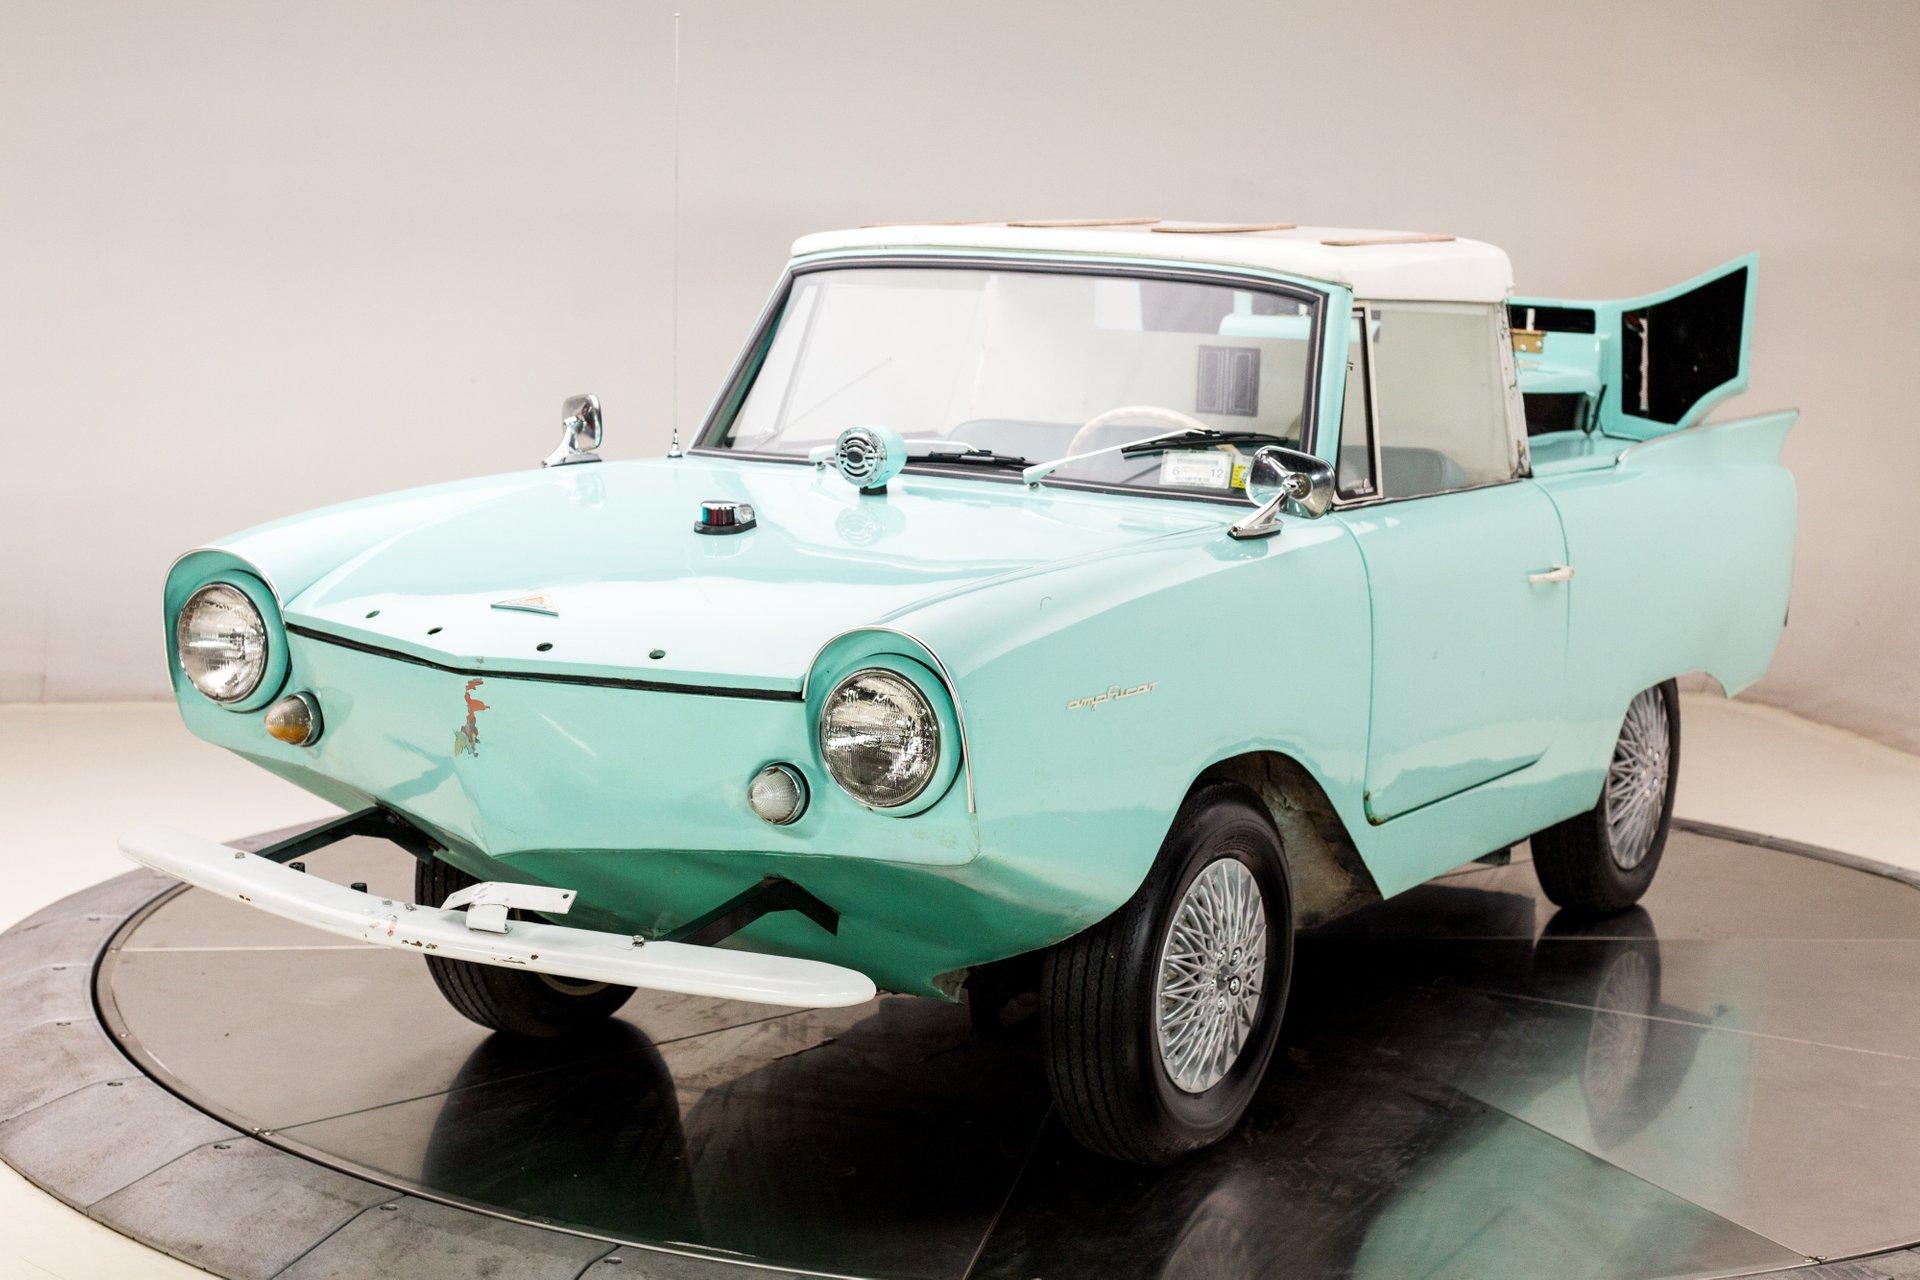 1969 Amphicar 770